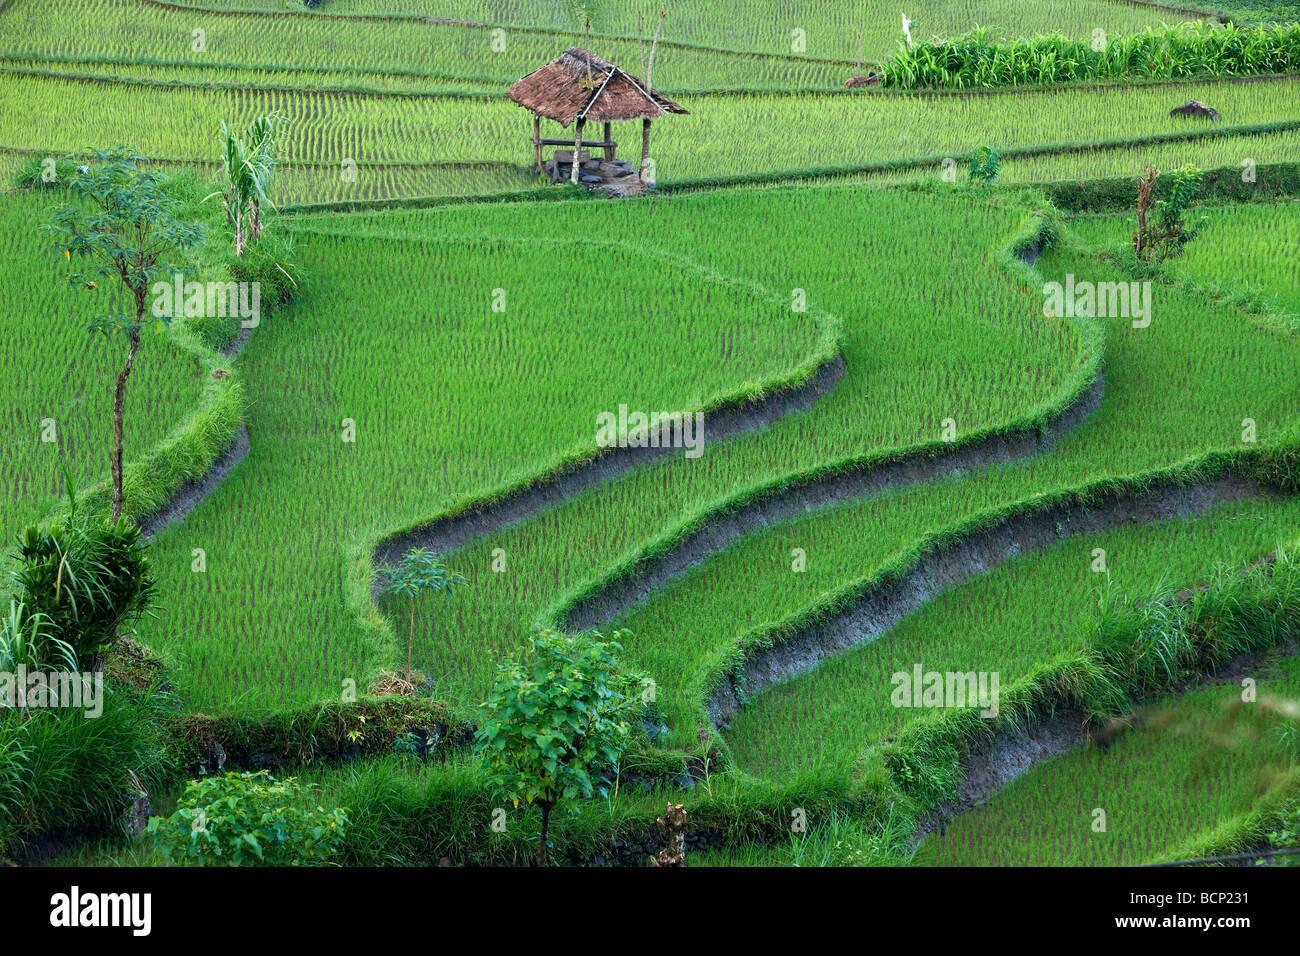 the terraced rice fields, near Tirtagangga, Bali, Indonesia - Stock Image